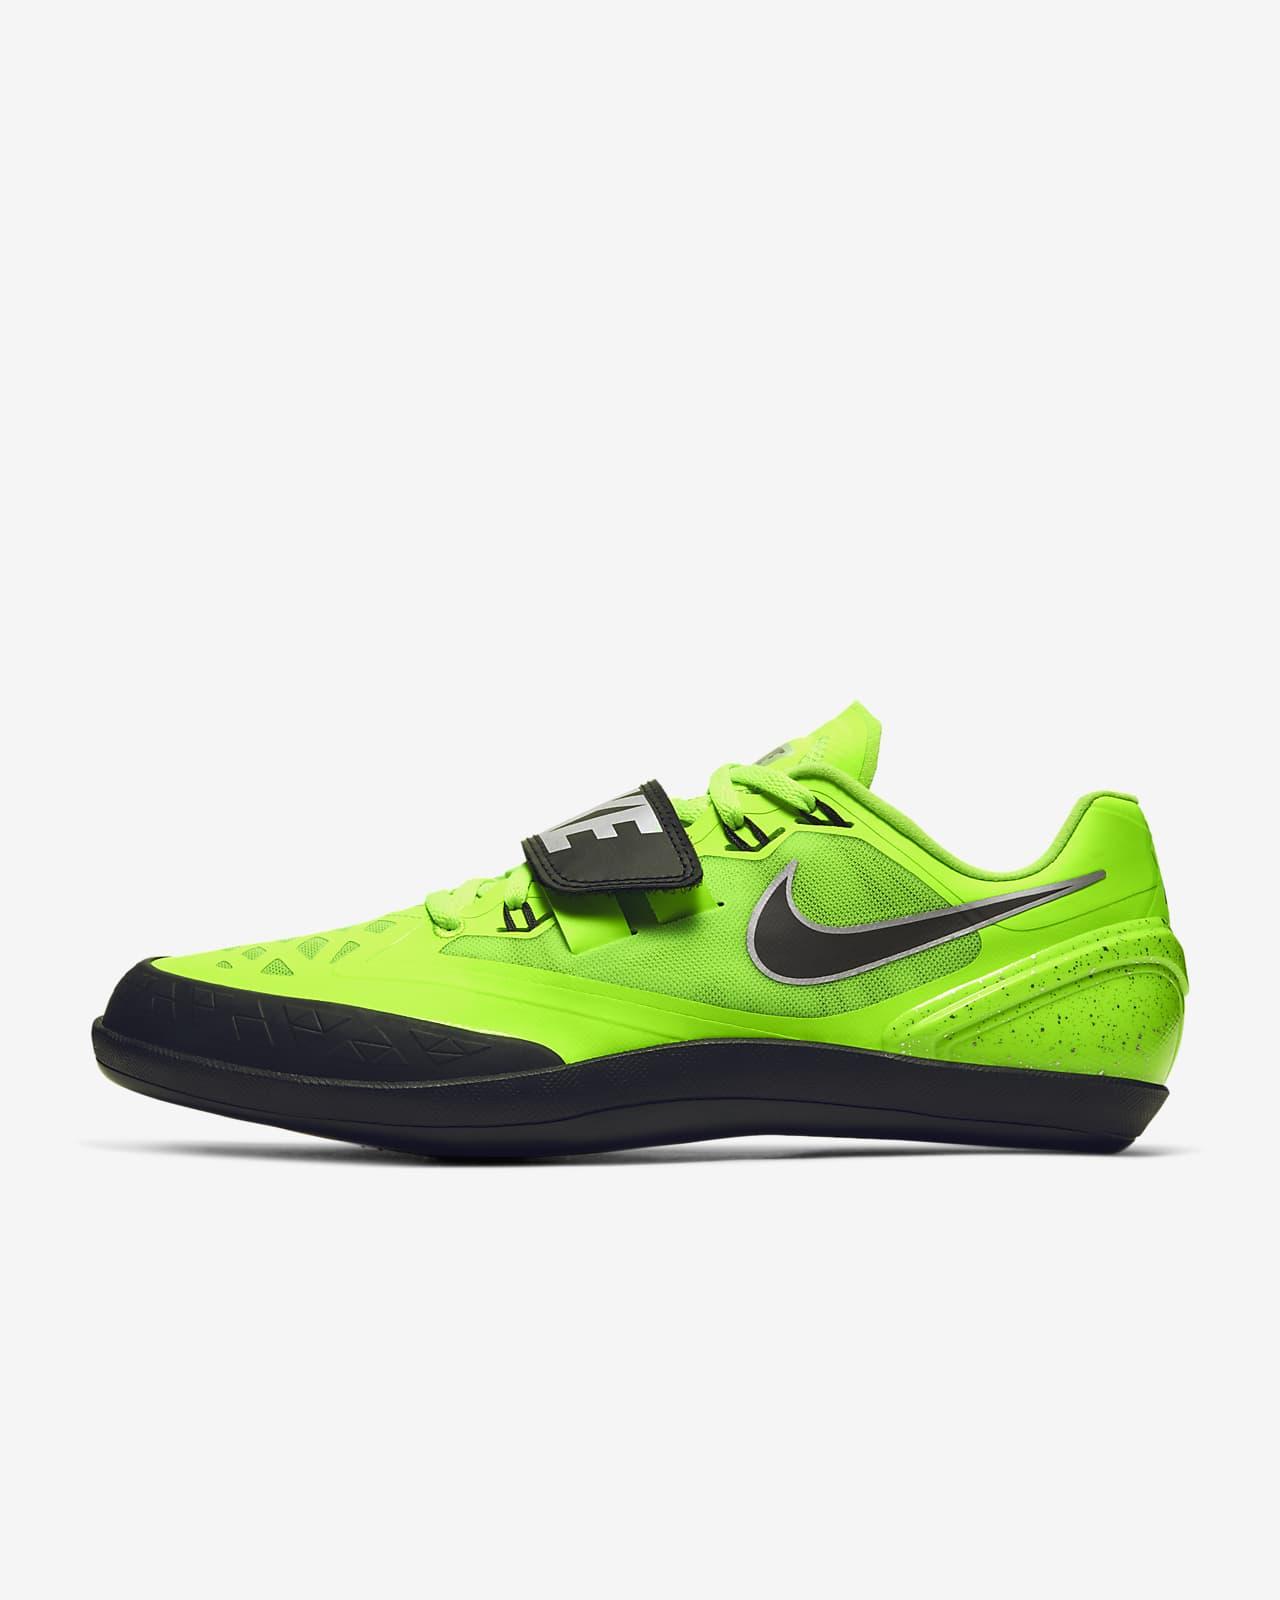 Nike Zoom Rotational 6 Unisex Throwing Shoe